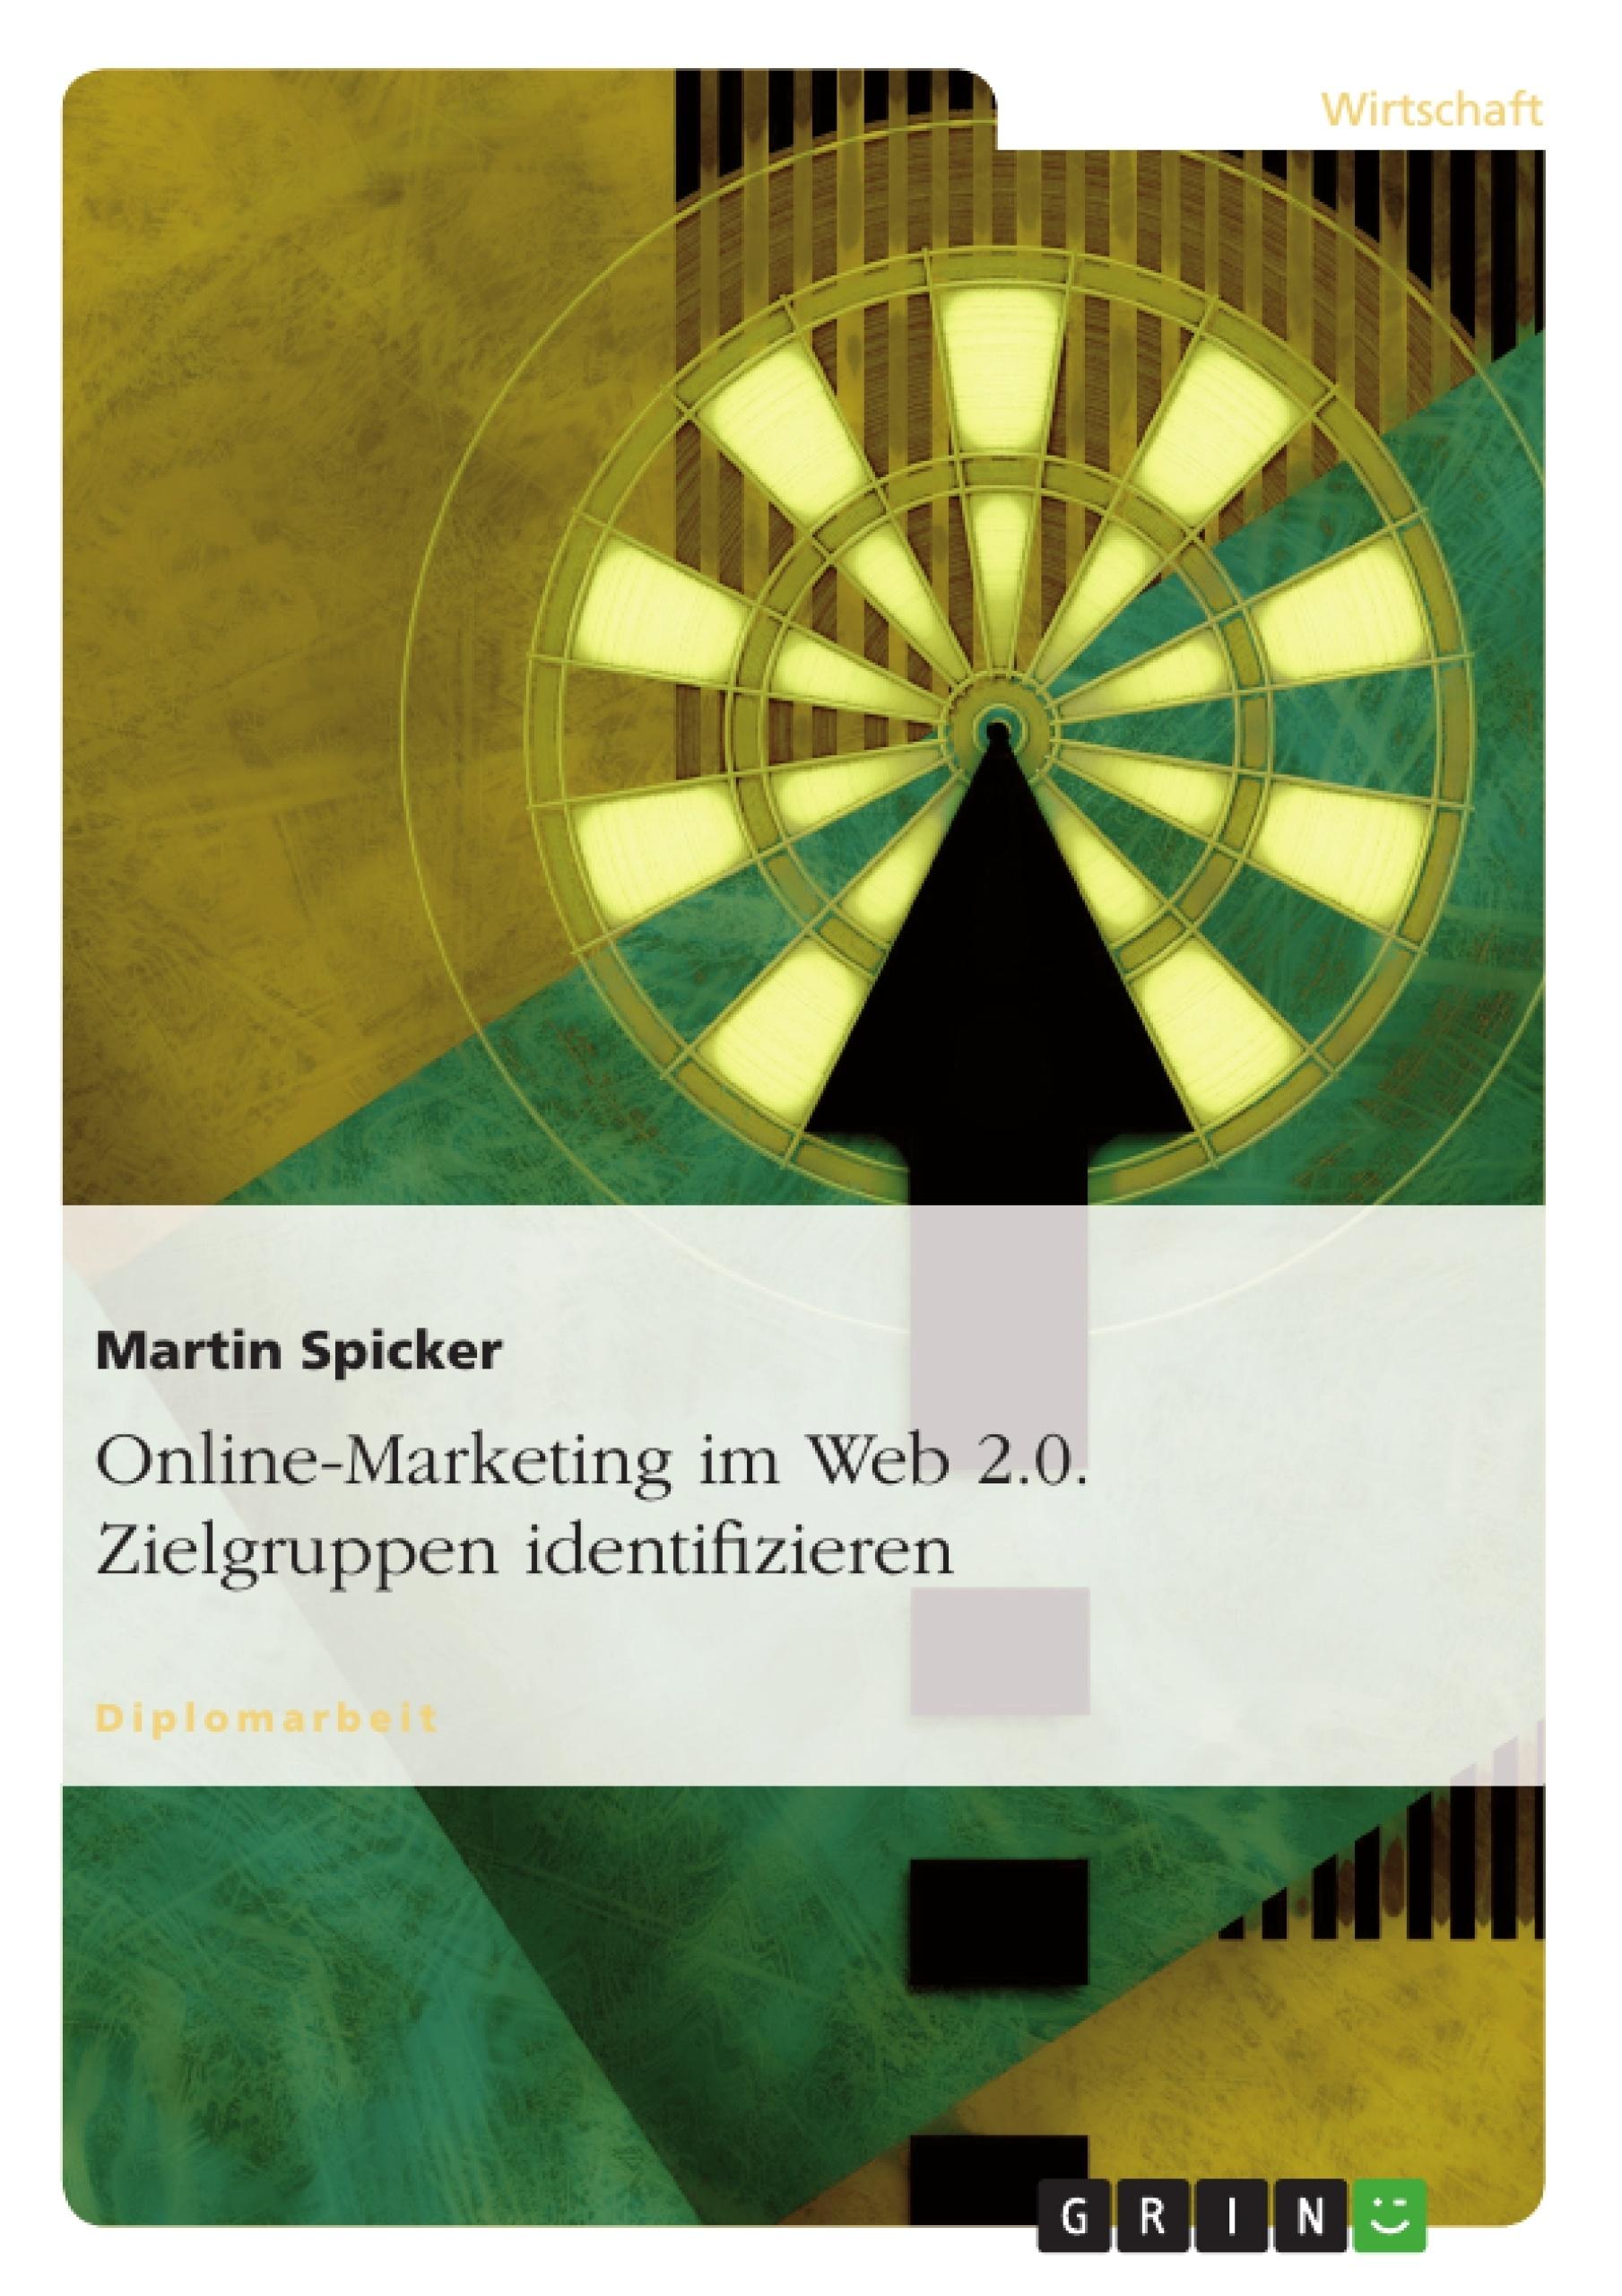 Titel: Online-Marketing im Web 2.0. Zielgruppen identifizieren